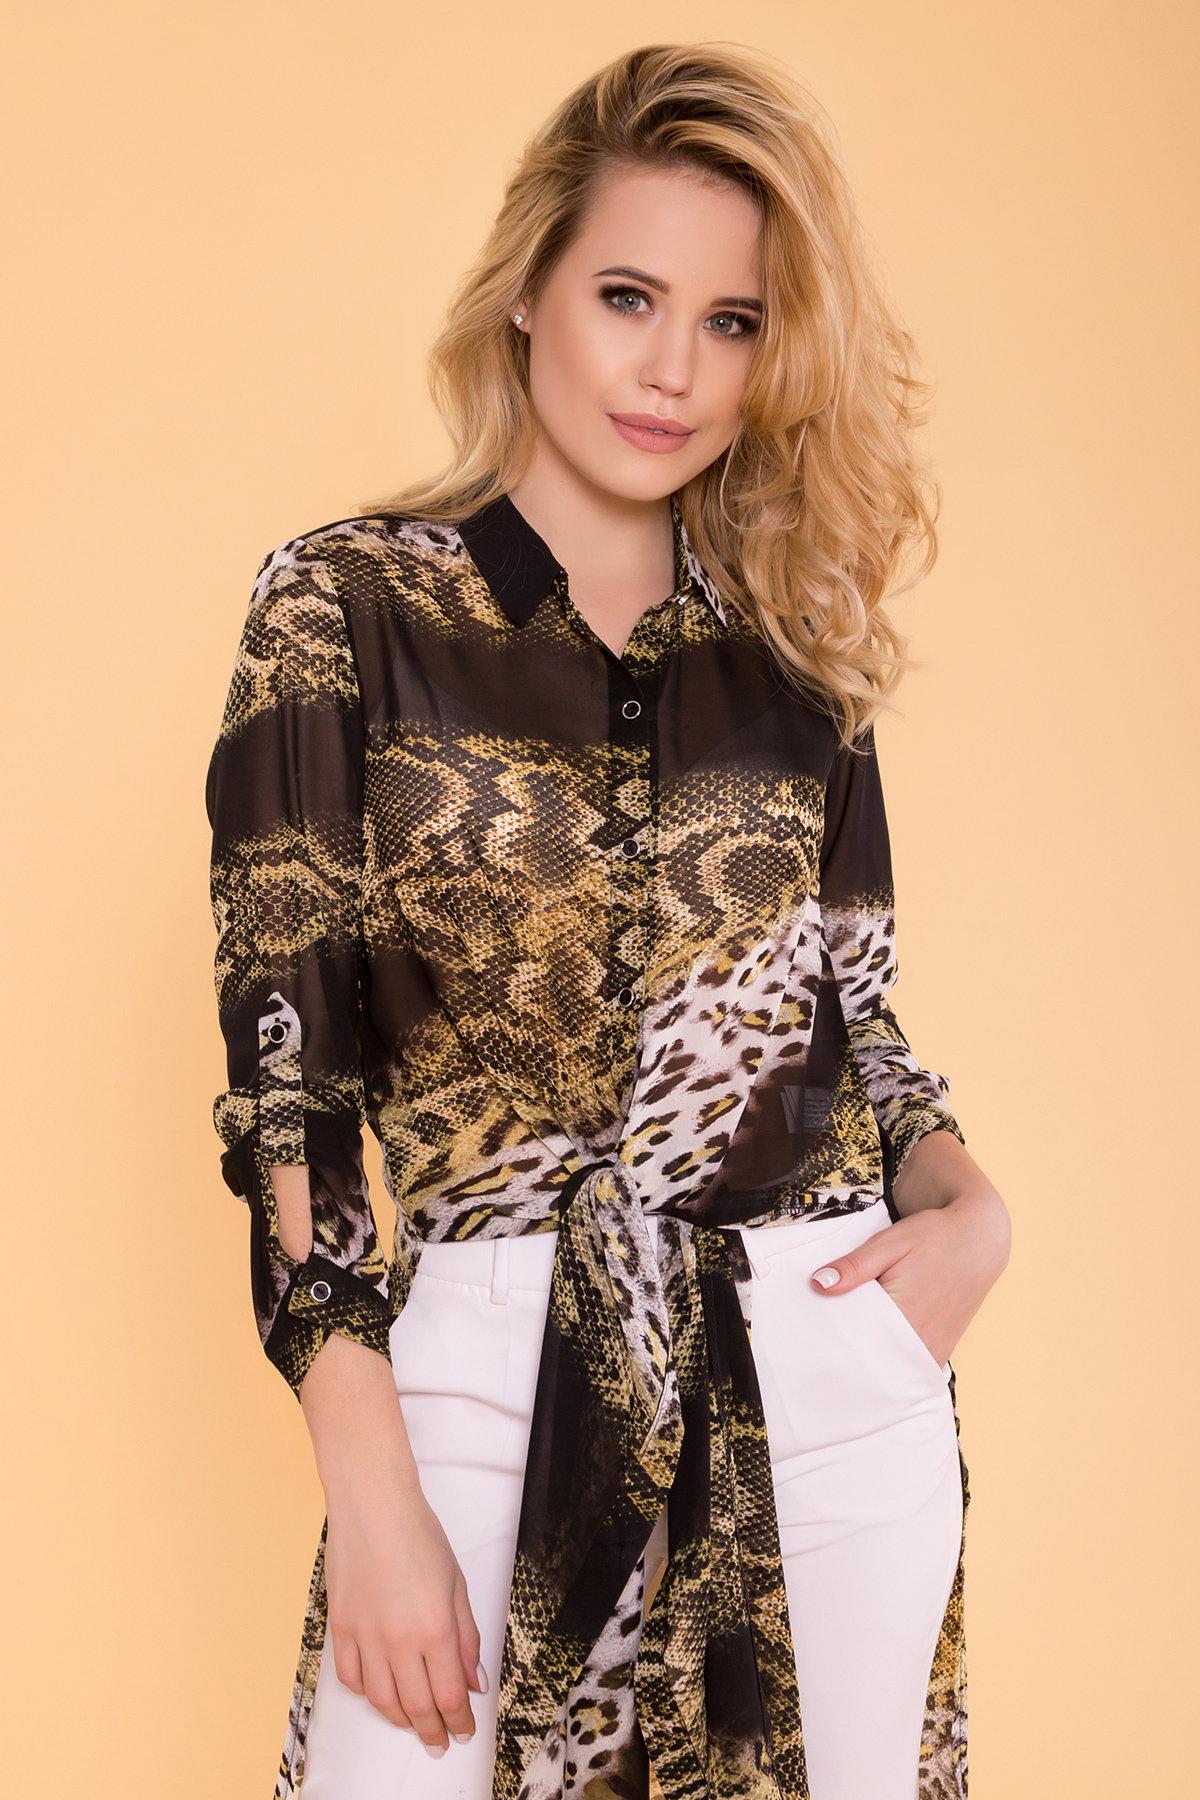 Рубашка Лайк 6892 АРТ. 41995 Цвет: Леоп абстр беж/чер - фото 4, интернет магазин tm-modus.ru